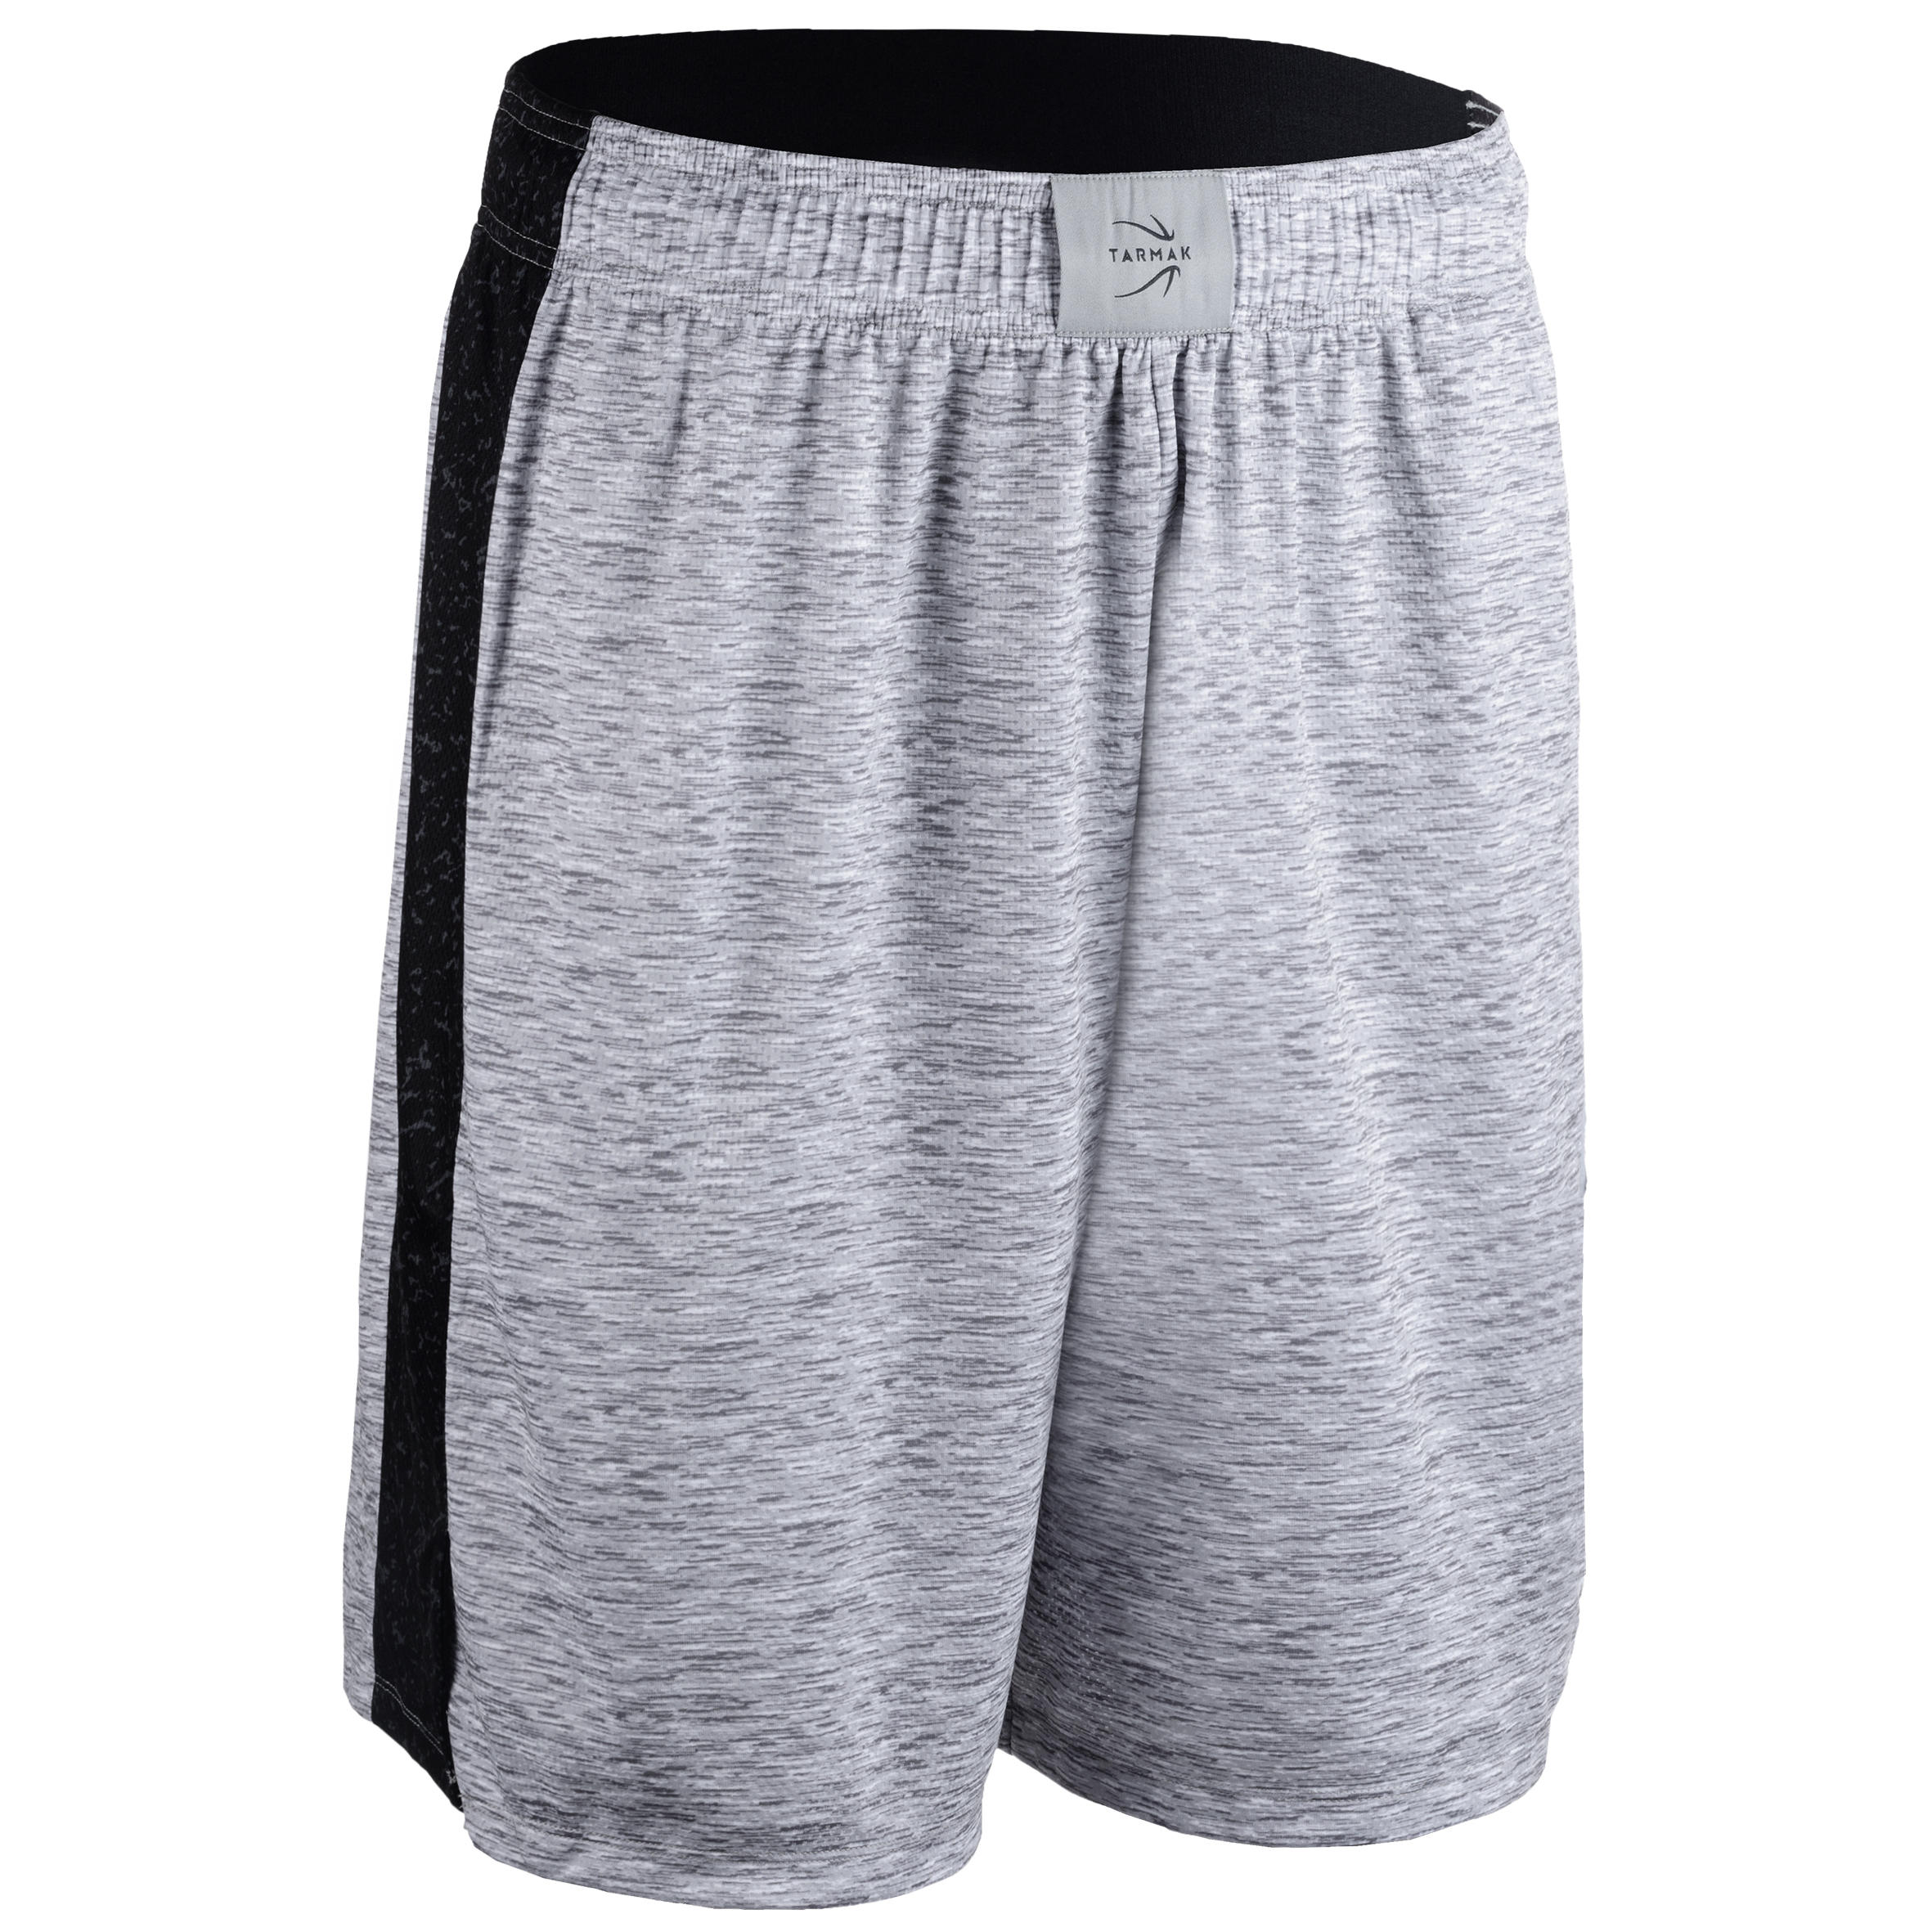 Basketballshorts SH500 Herren Fortgeschrittene grau   Sportbekleidung > Sporthosen > Basketballshorts   Grau - Blau   Tarmak